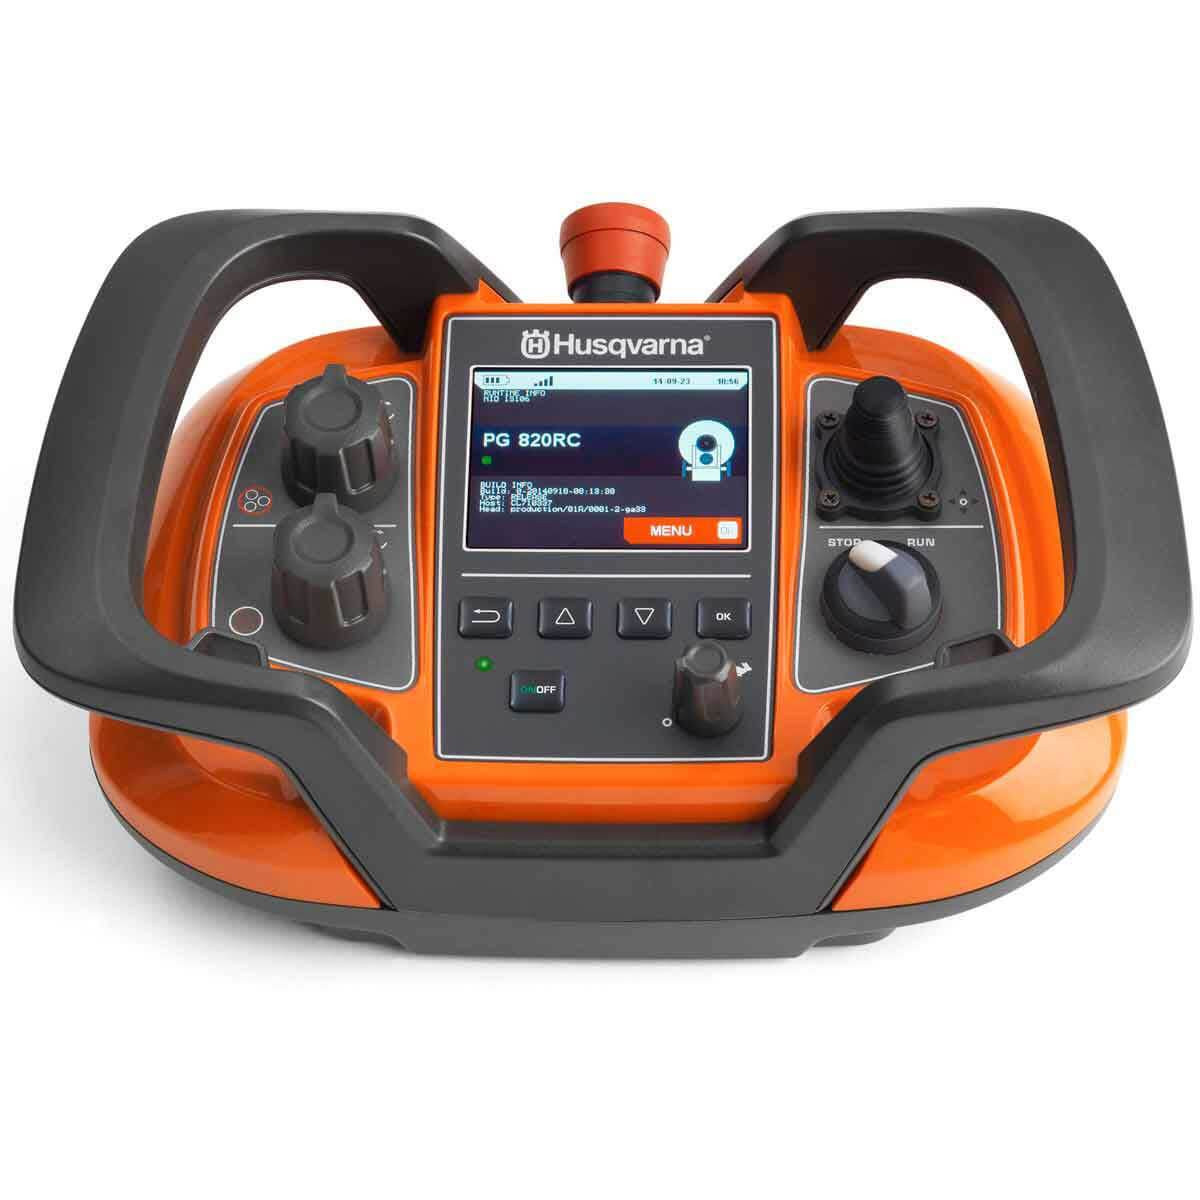 Husqvarna PG 820 RC tool box